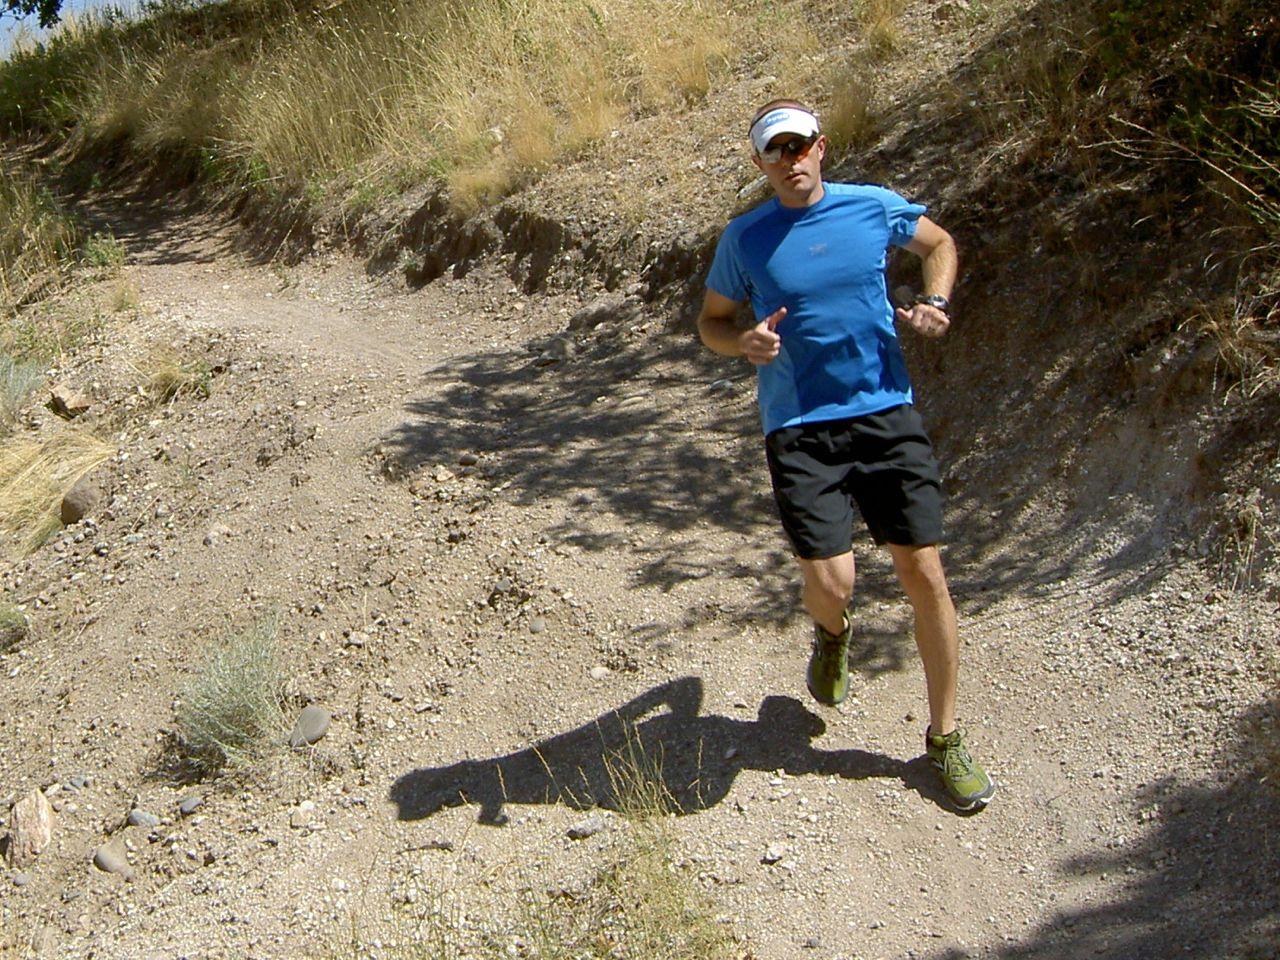 2ea9d33d9019a Brooks Cascadia 5 Trail Running Shoes Review - FeedTheHabit.com